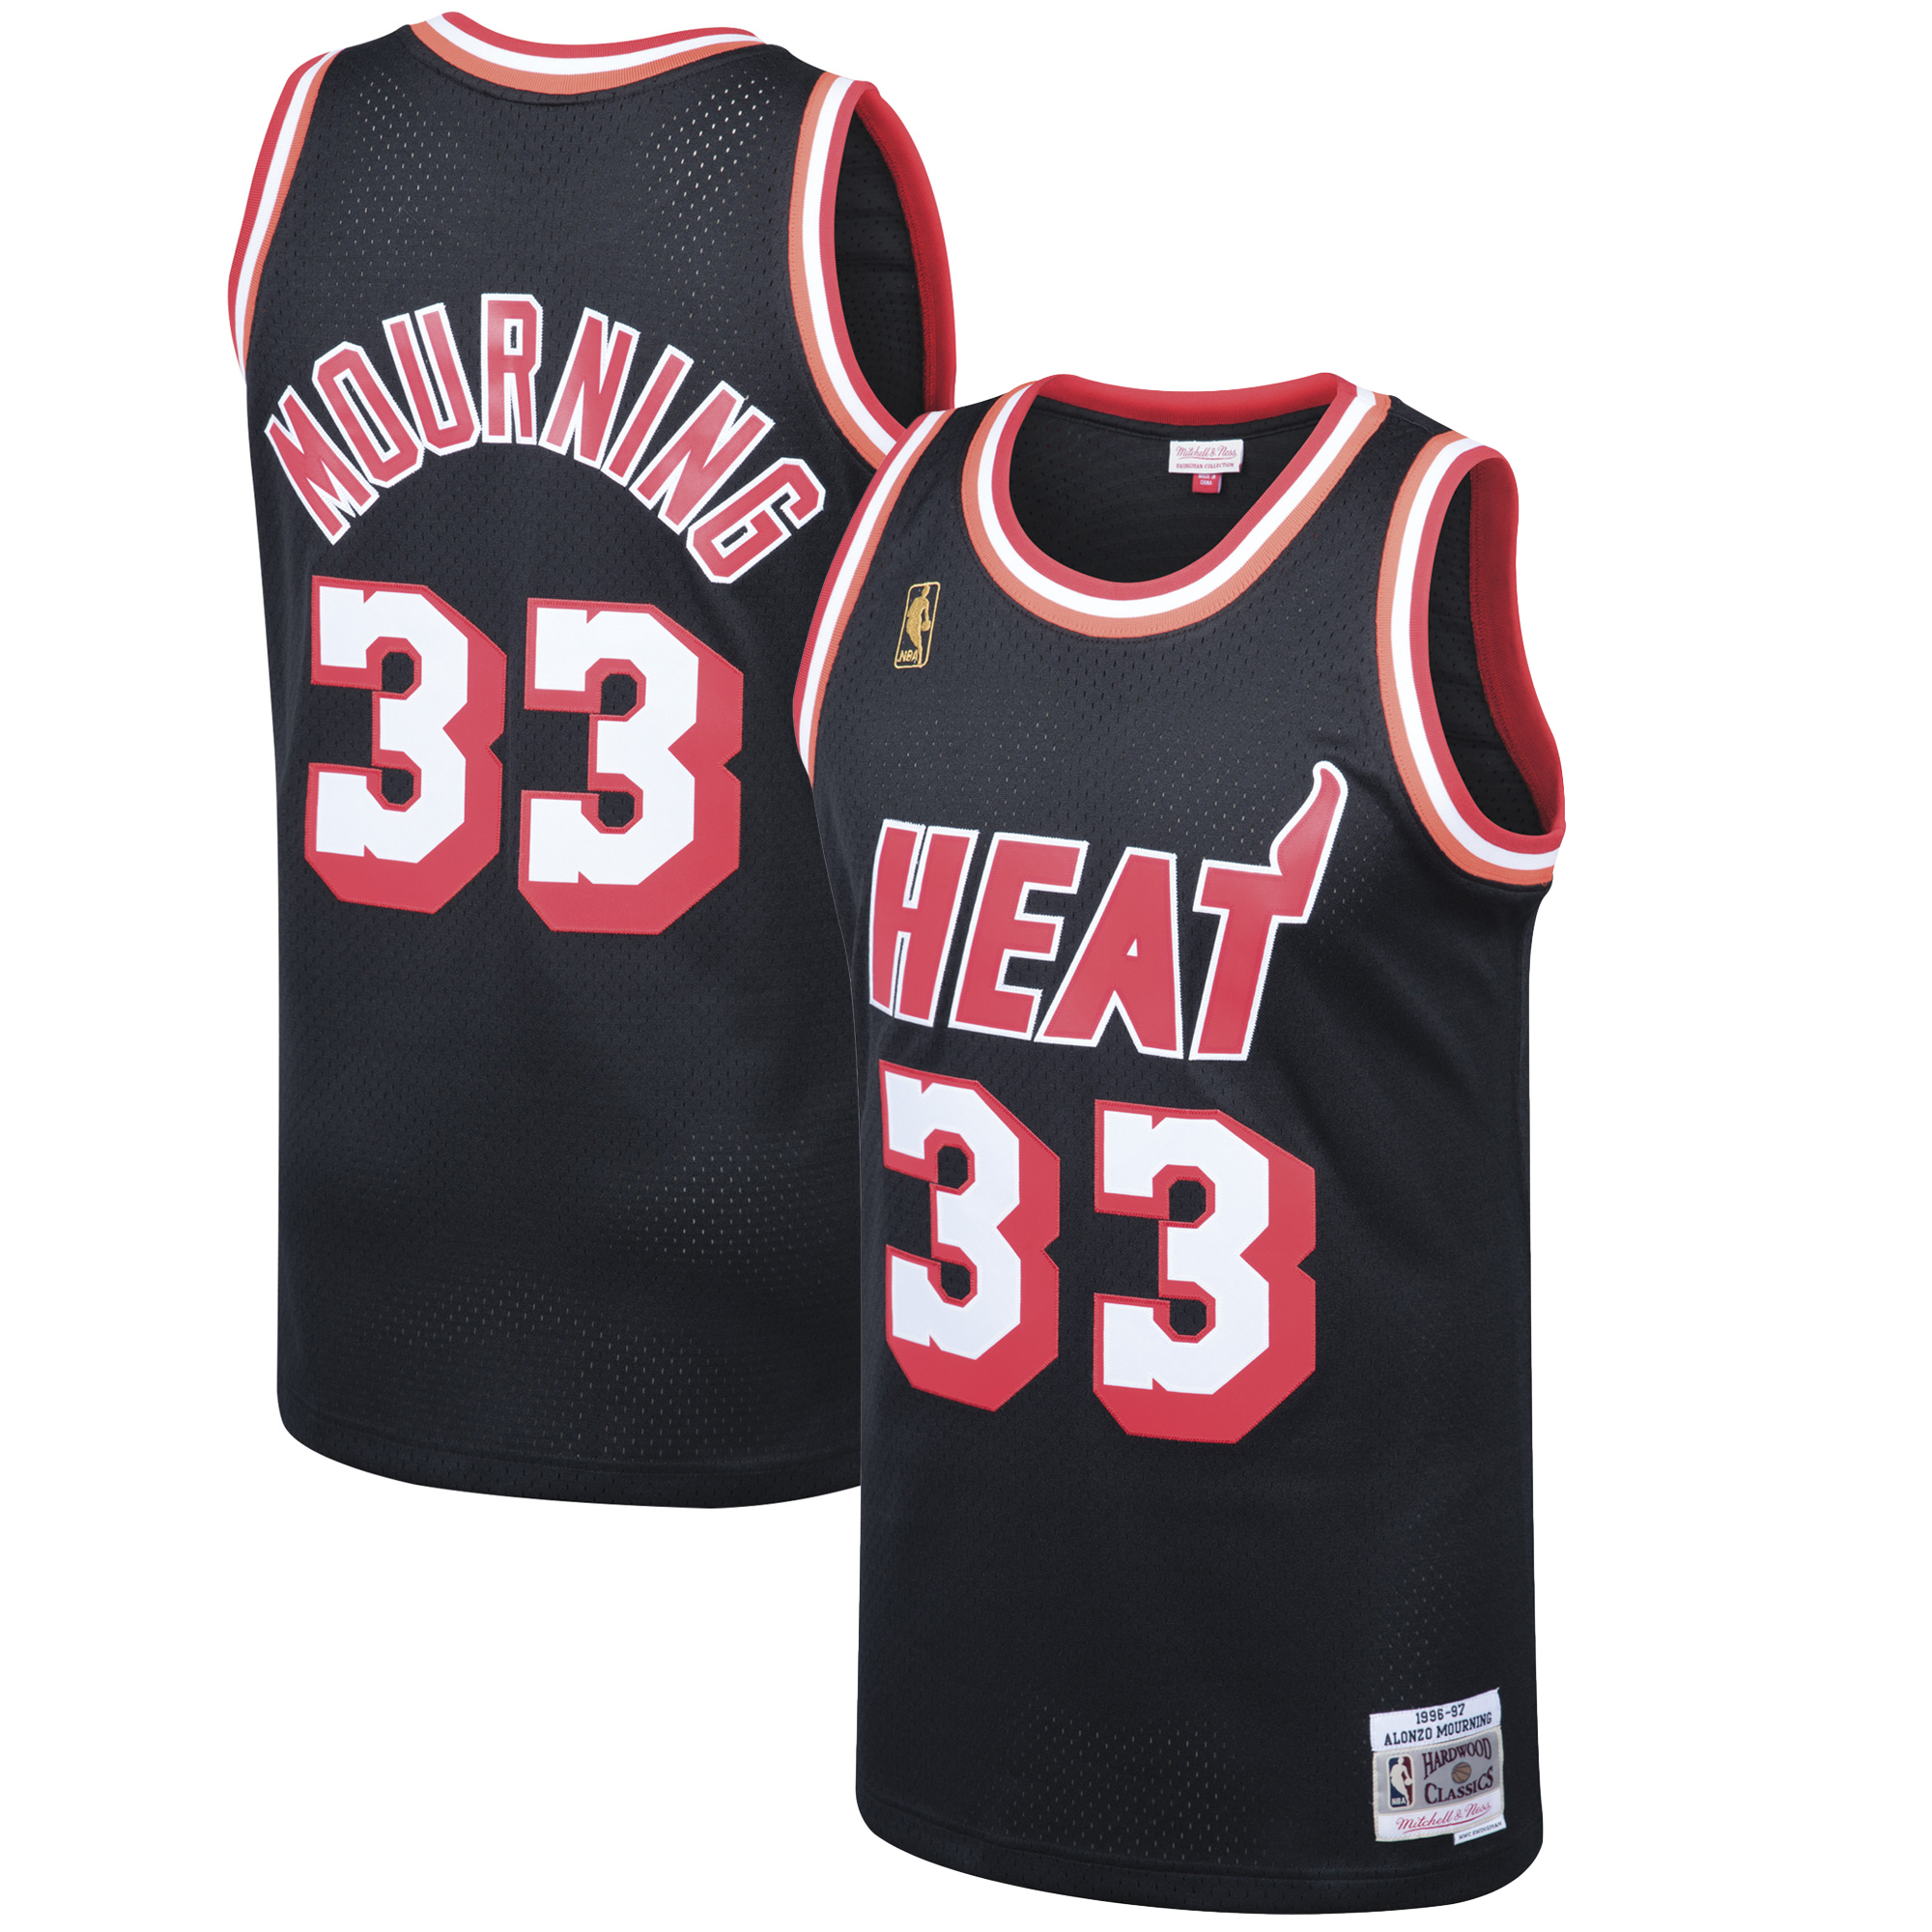 Alonzo Mourning Miami Heat Mitchell & Ness 1996-97 Hardwood Classics Swingman Jersey - Black